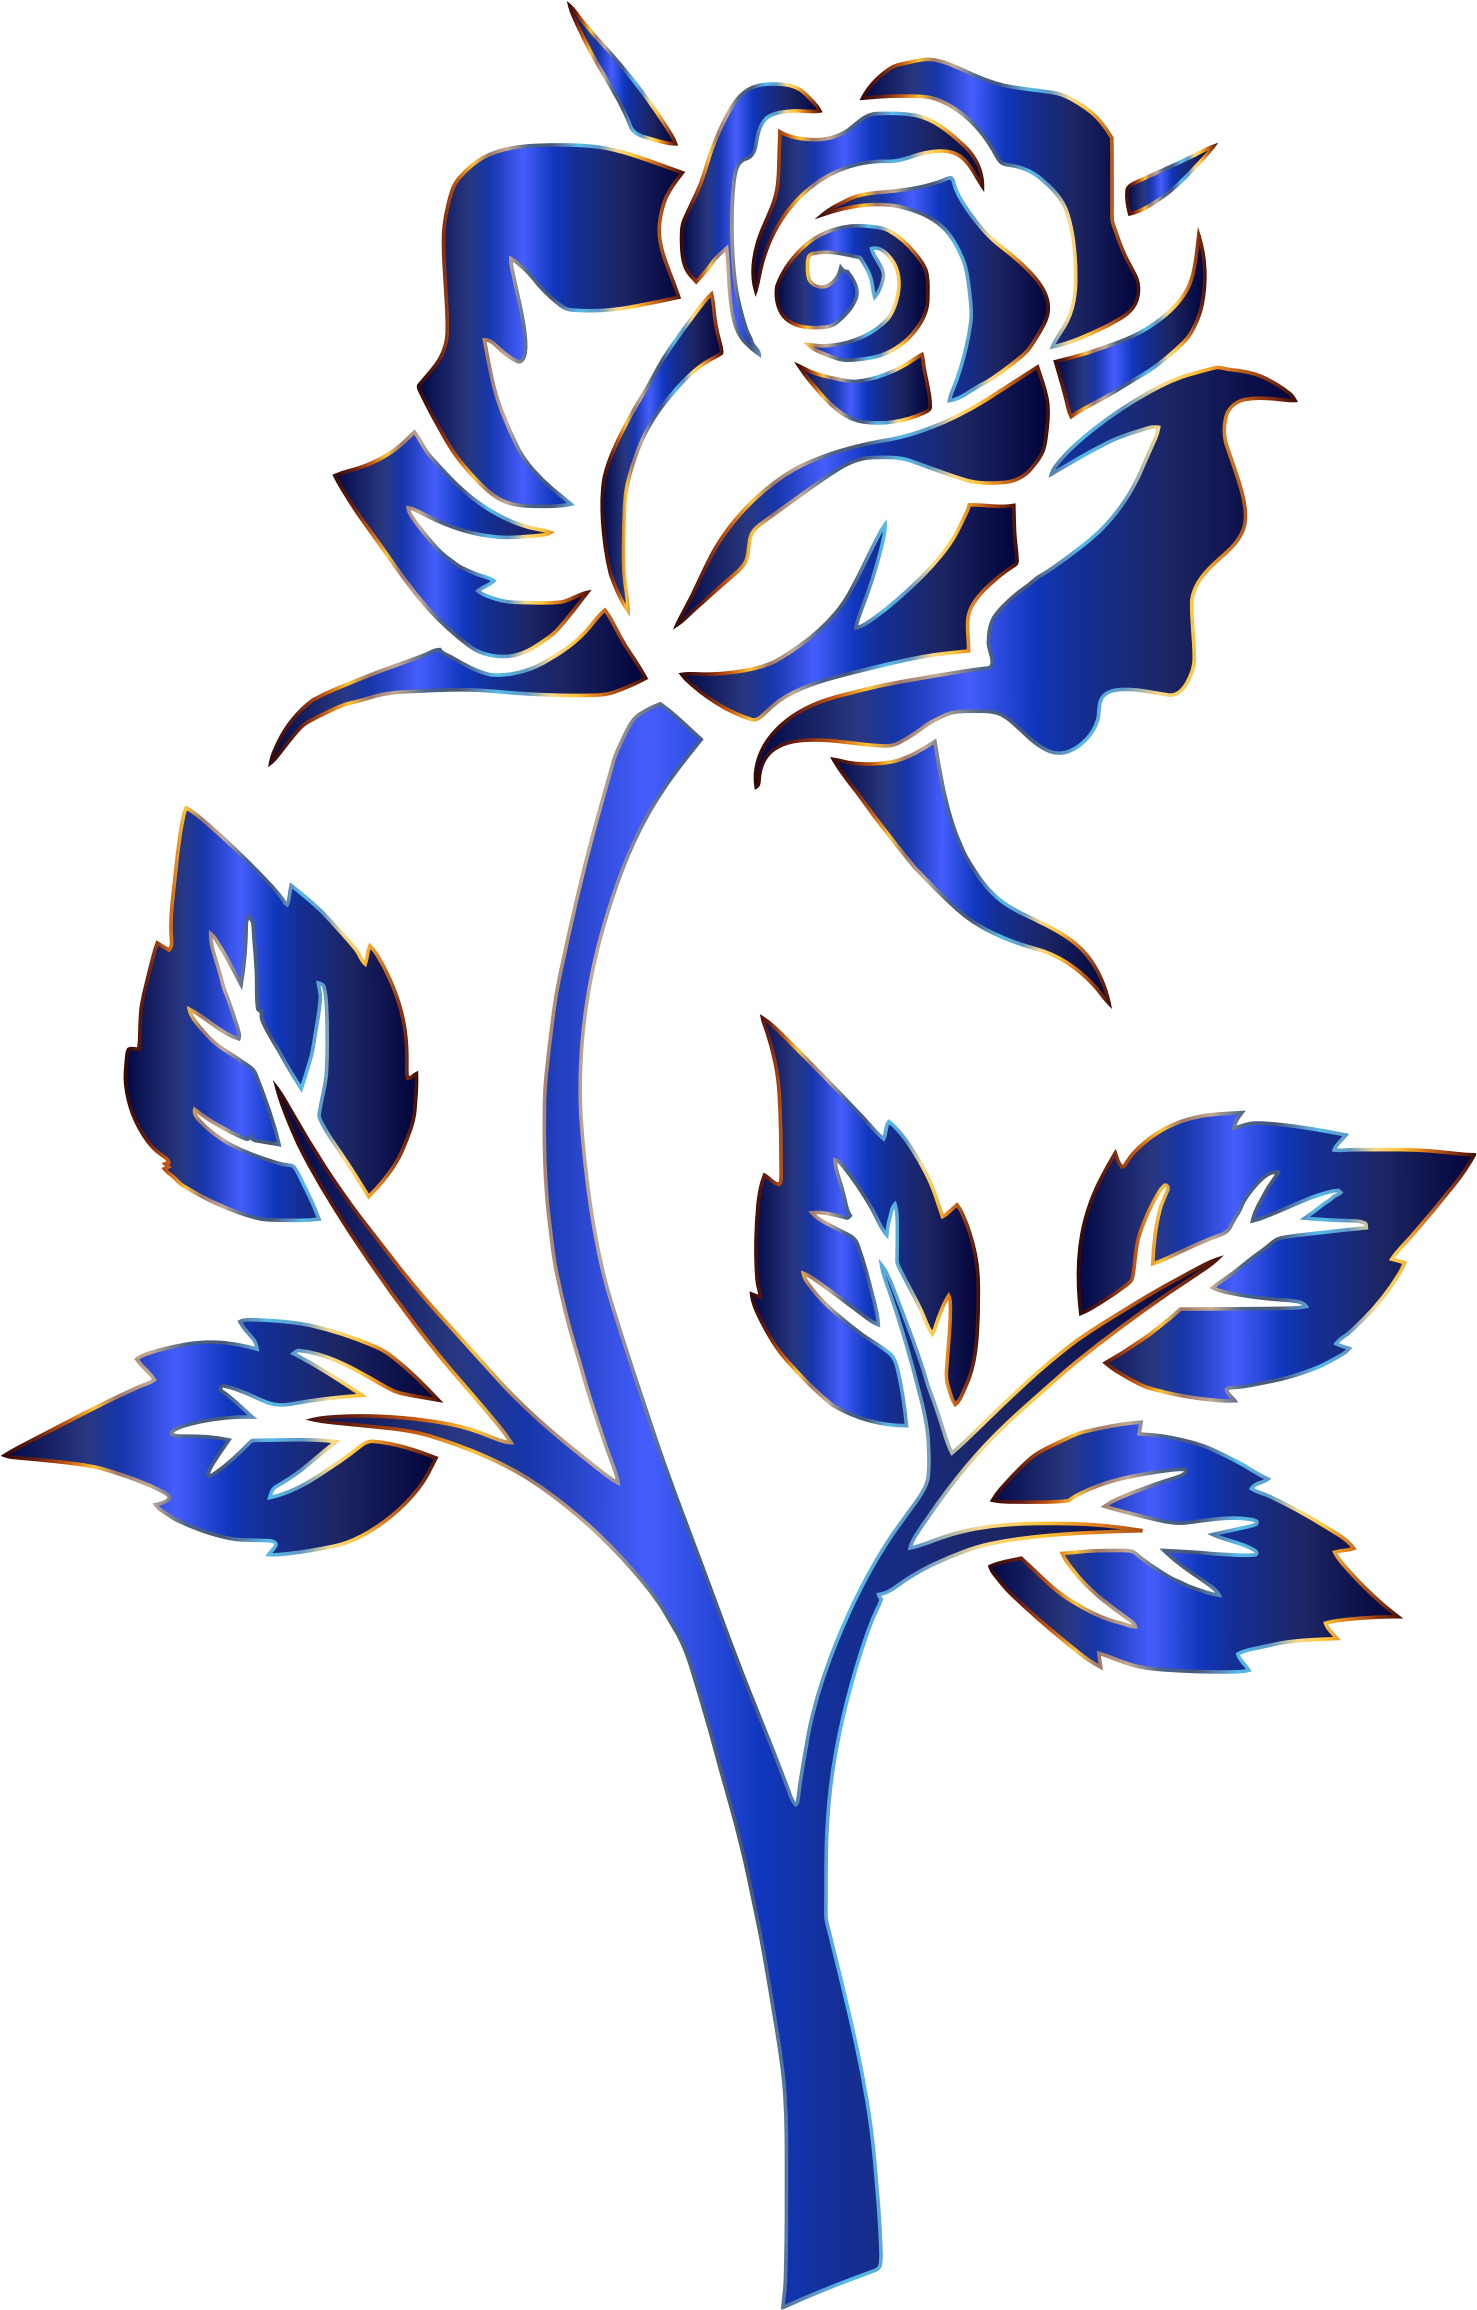 Rose Silhouette Clip Art at GetDrawings | Free download